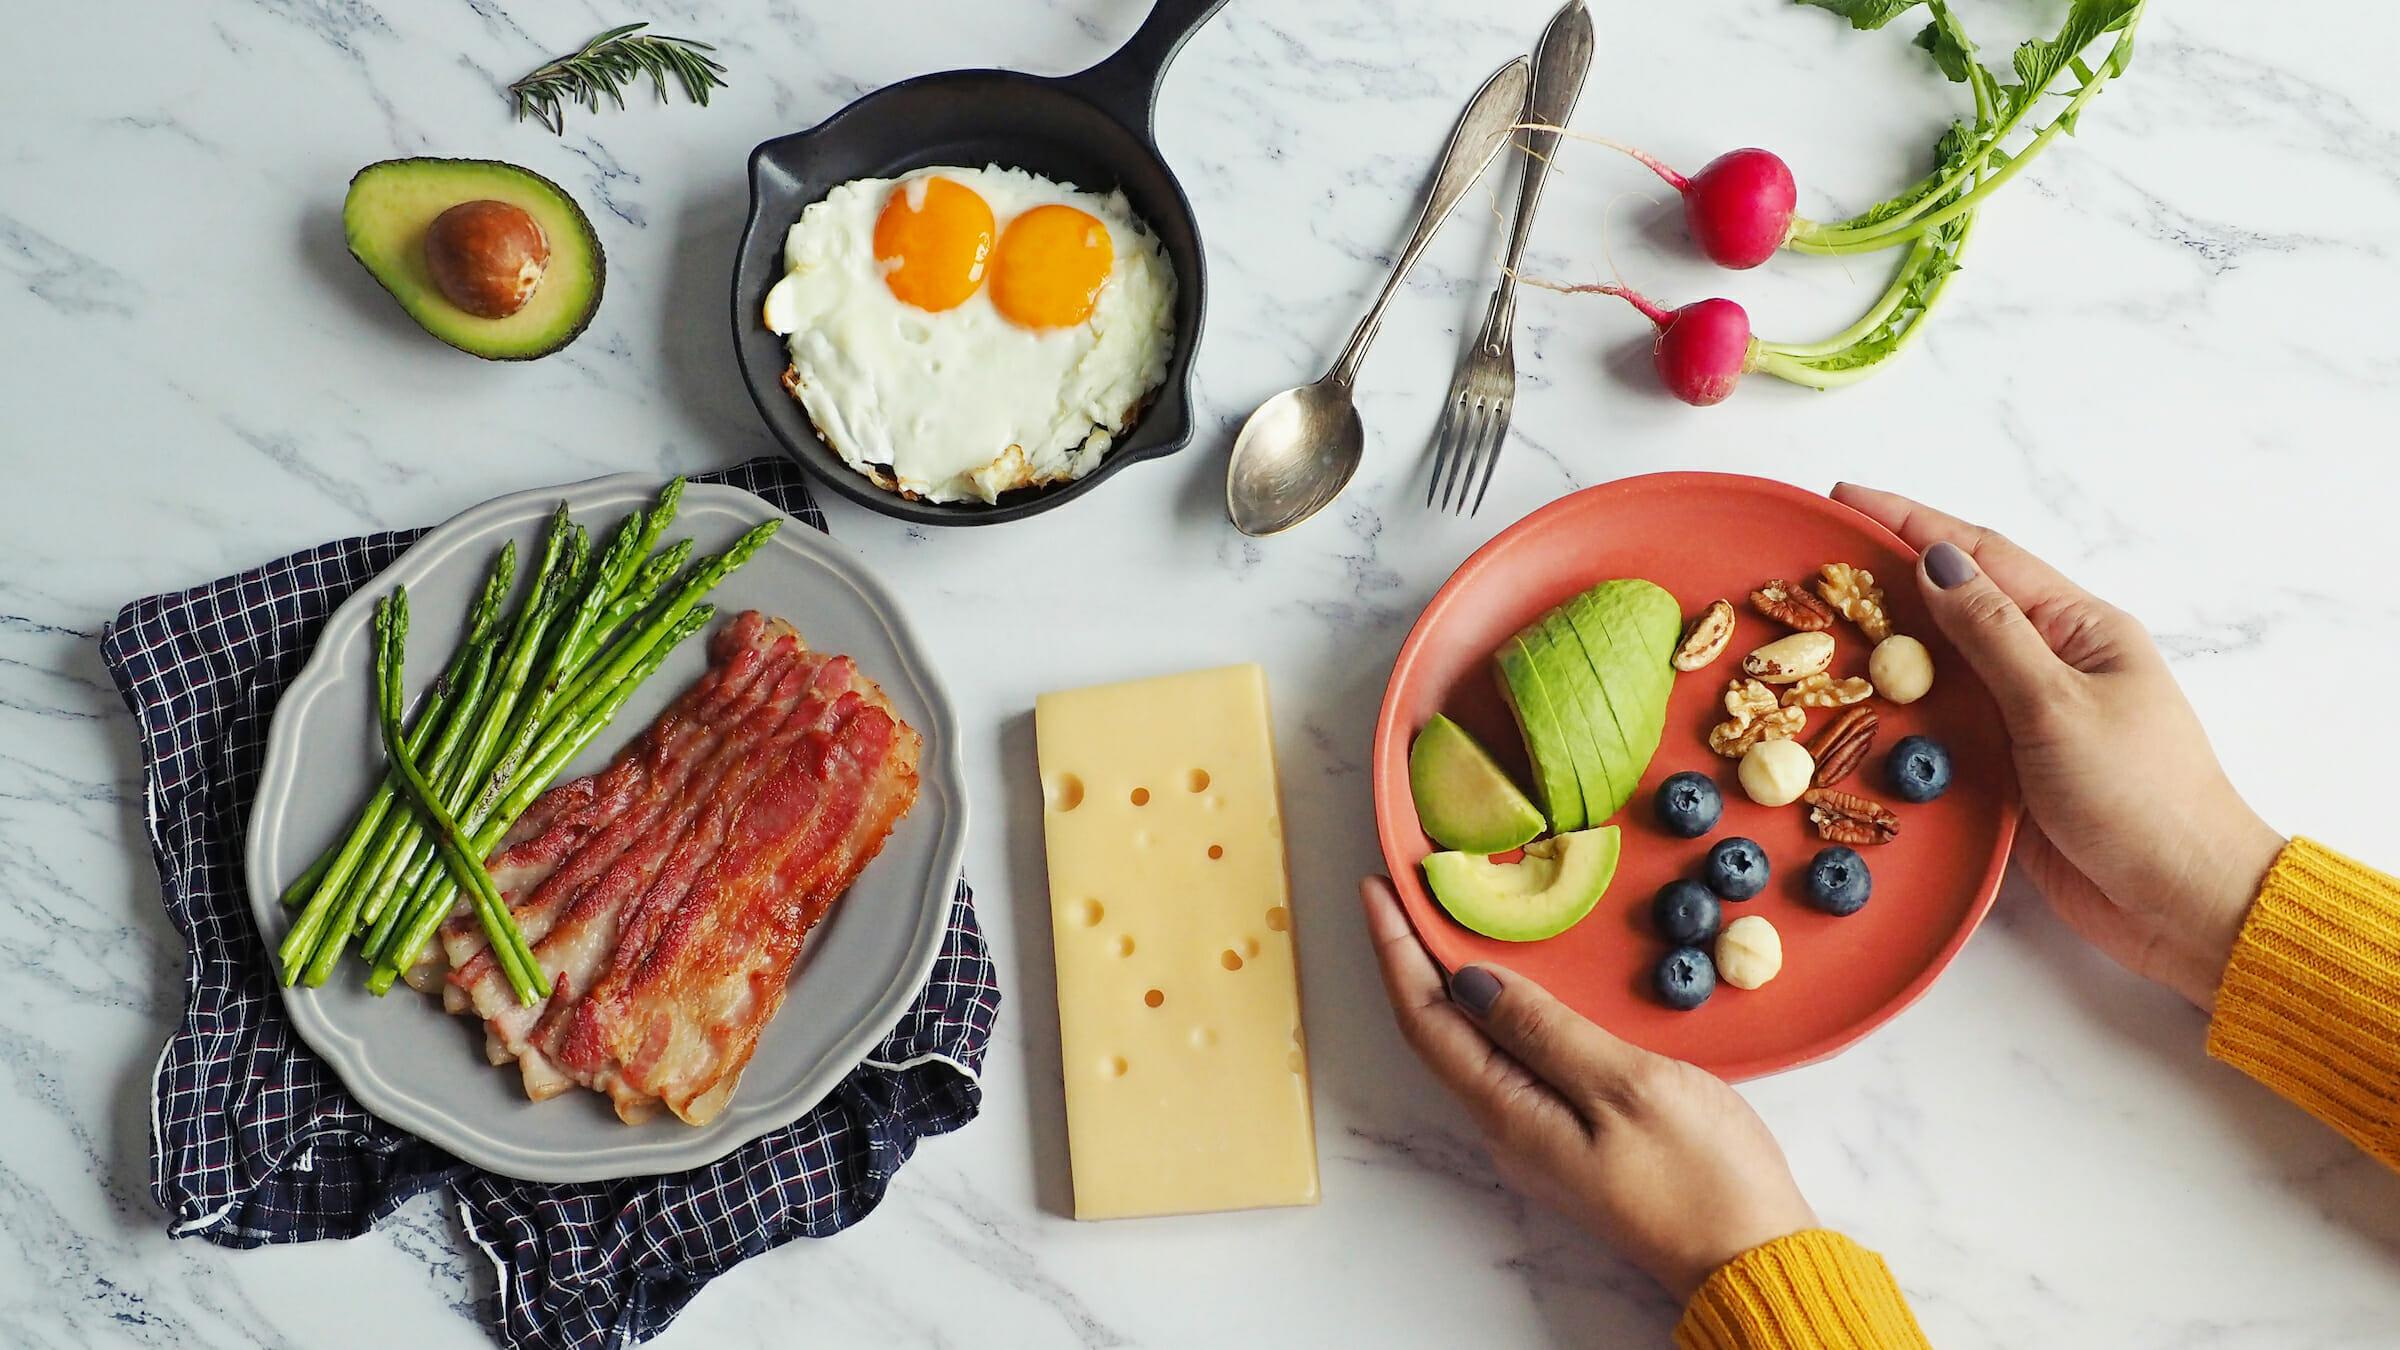 Keto Meal plan - Ketogenic diet meal preparation copy